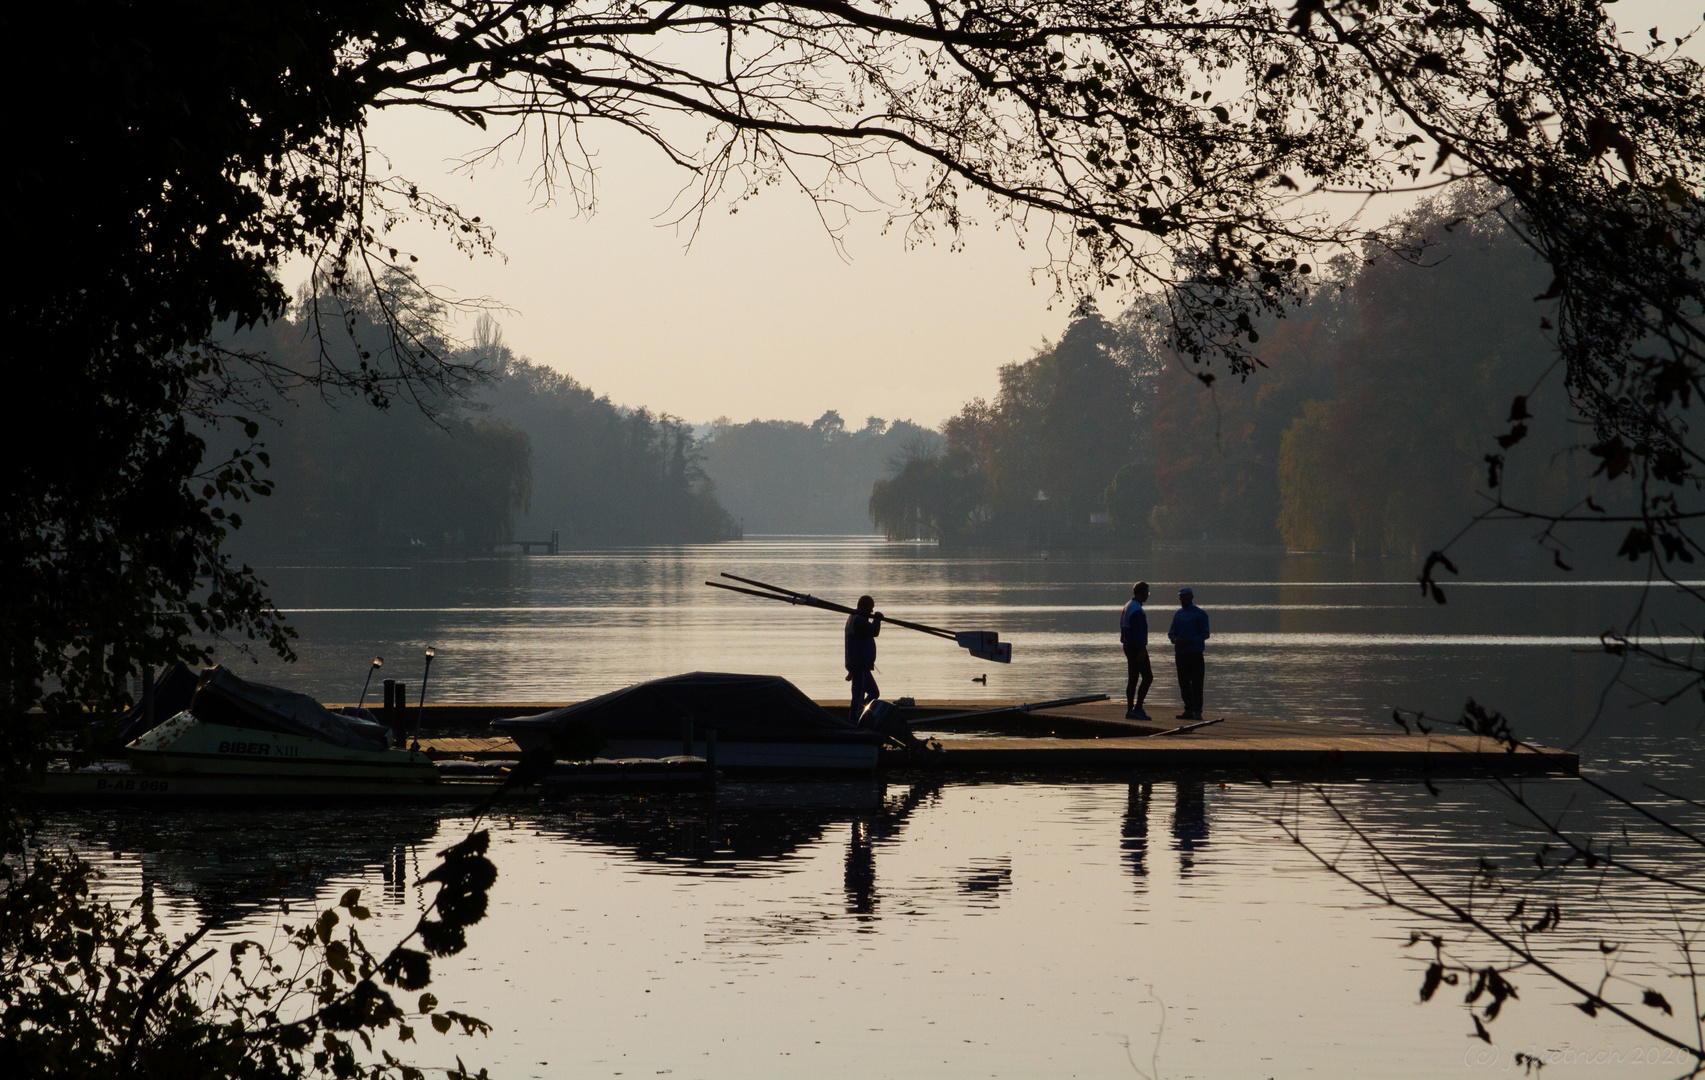 Novembernachmittag am Kleinen Wannsee (1)